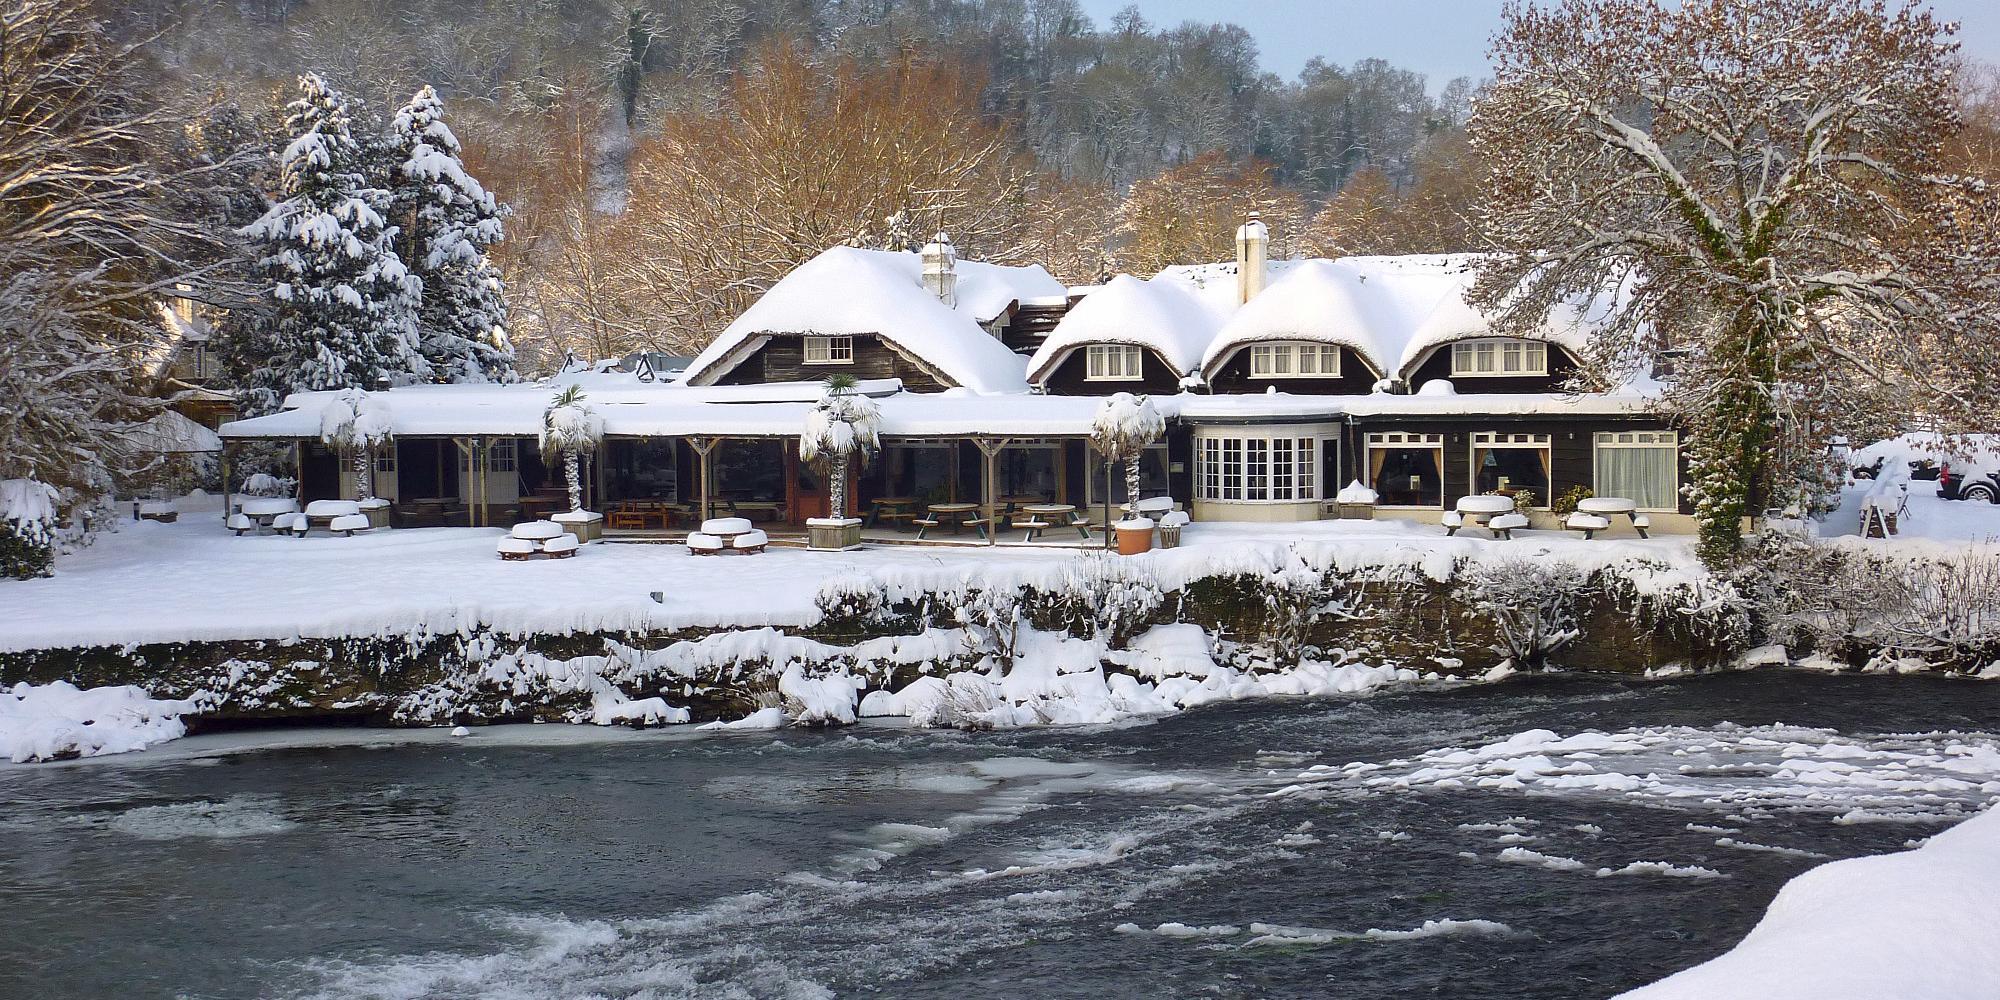 Fisherman's Cot in winter